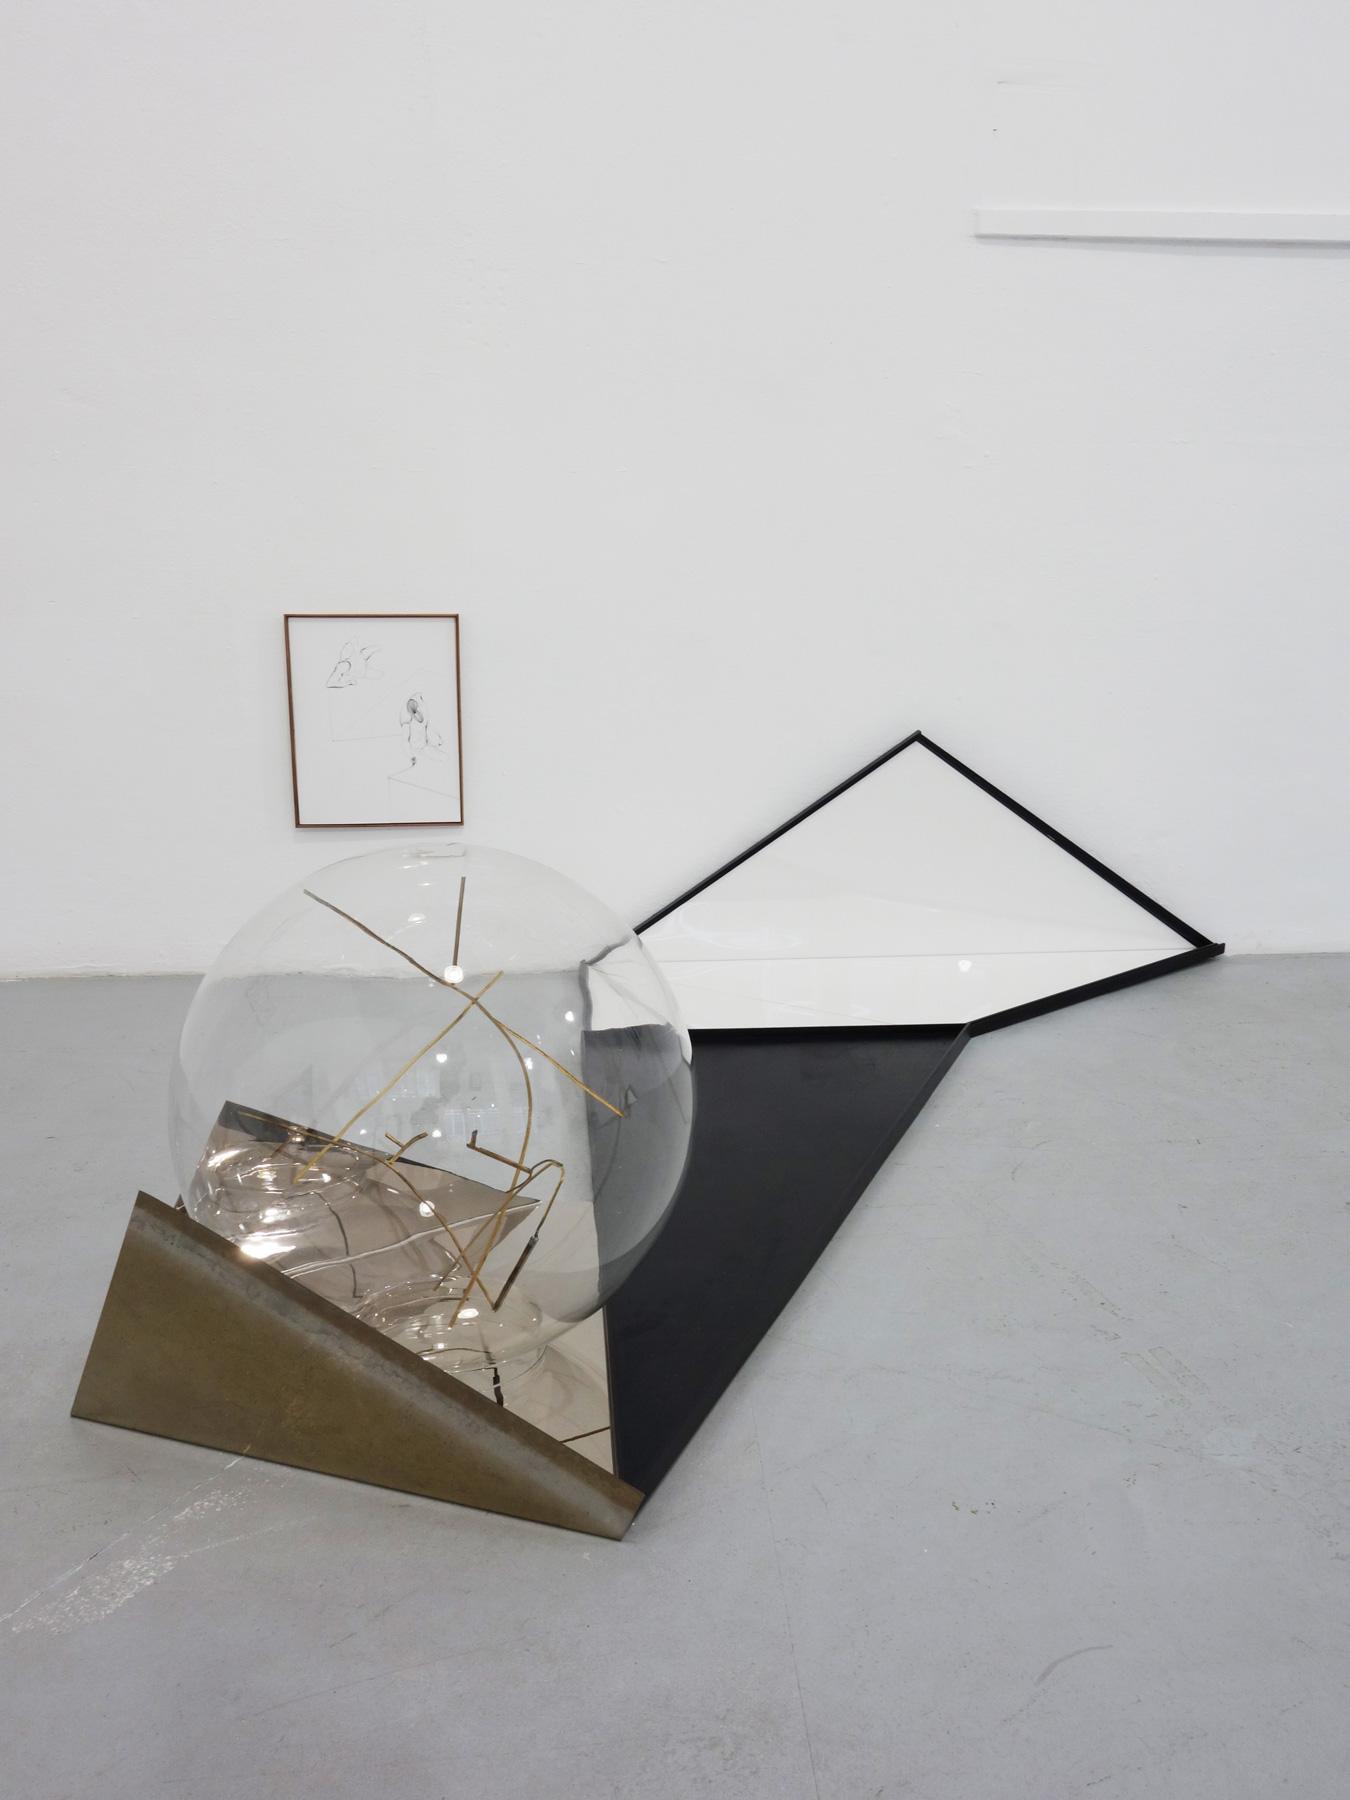 Nina Annabelle Märkl   Permeable Entities   Installation   Artothek München   2016/2017